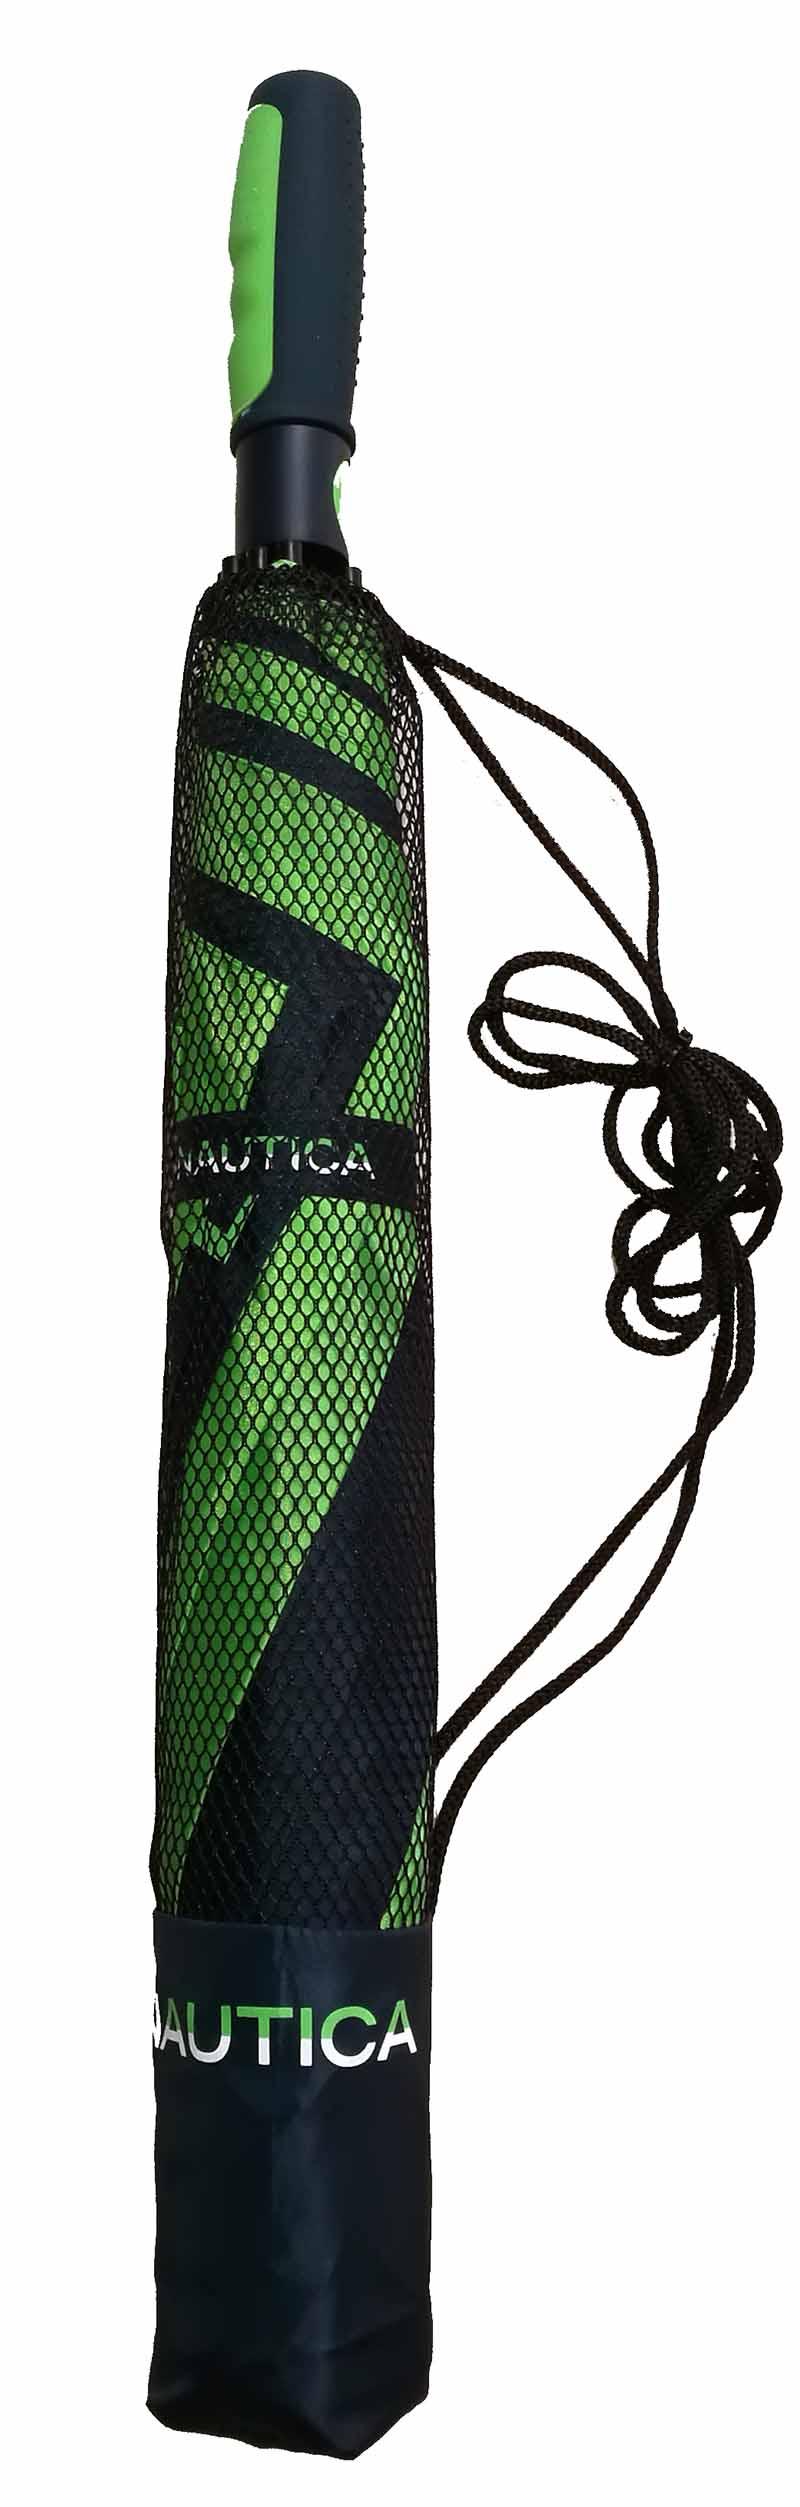 Sombrilla de golf Nautica verde 60 02